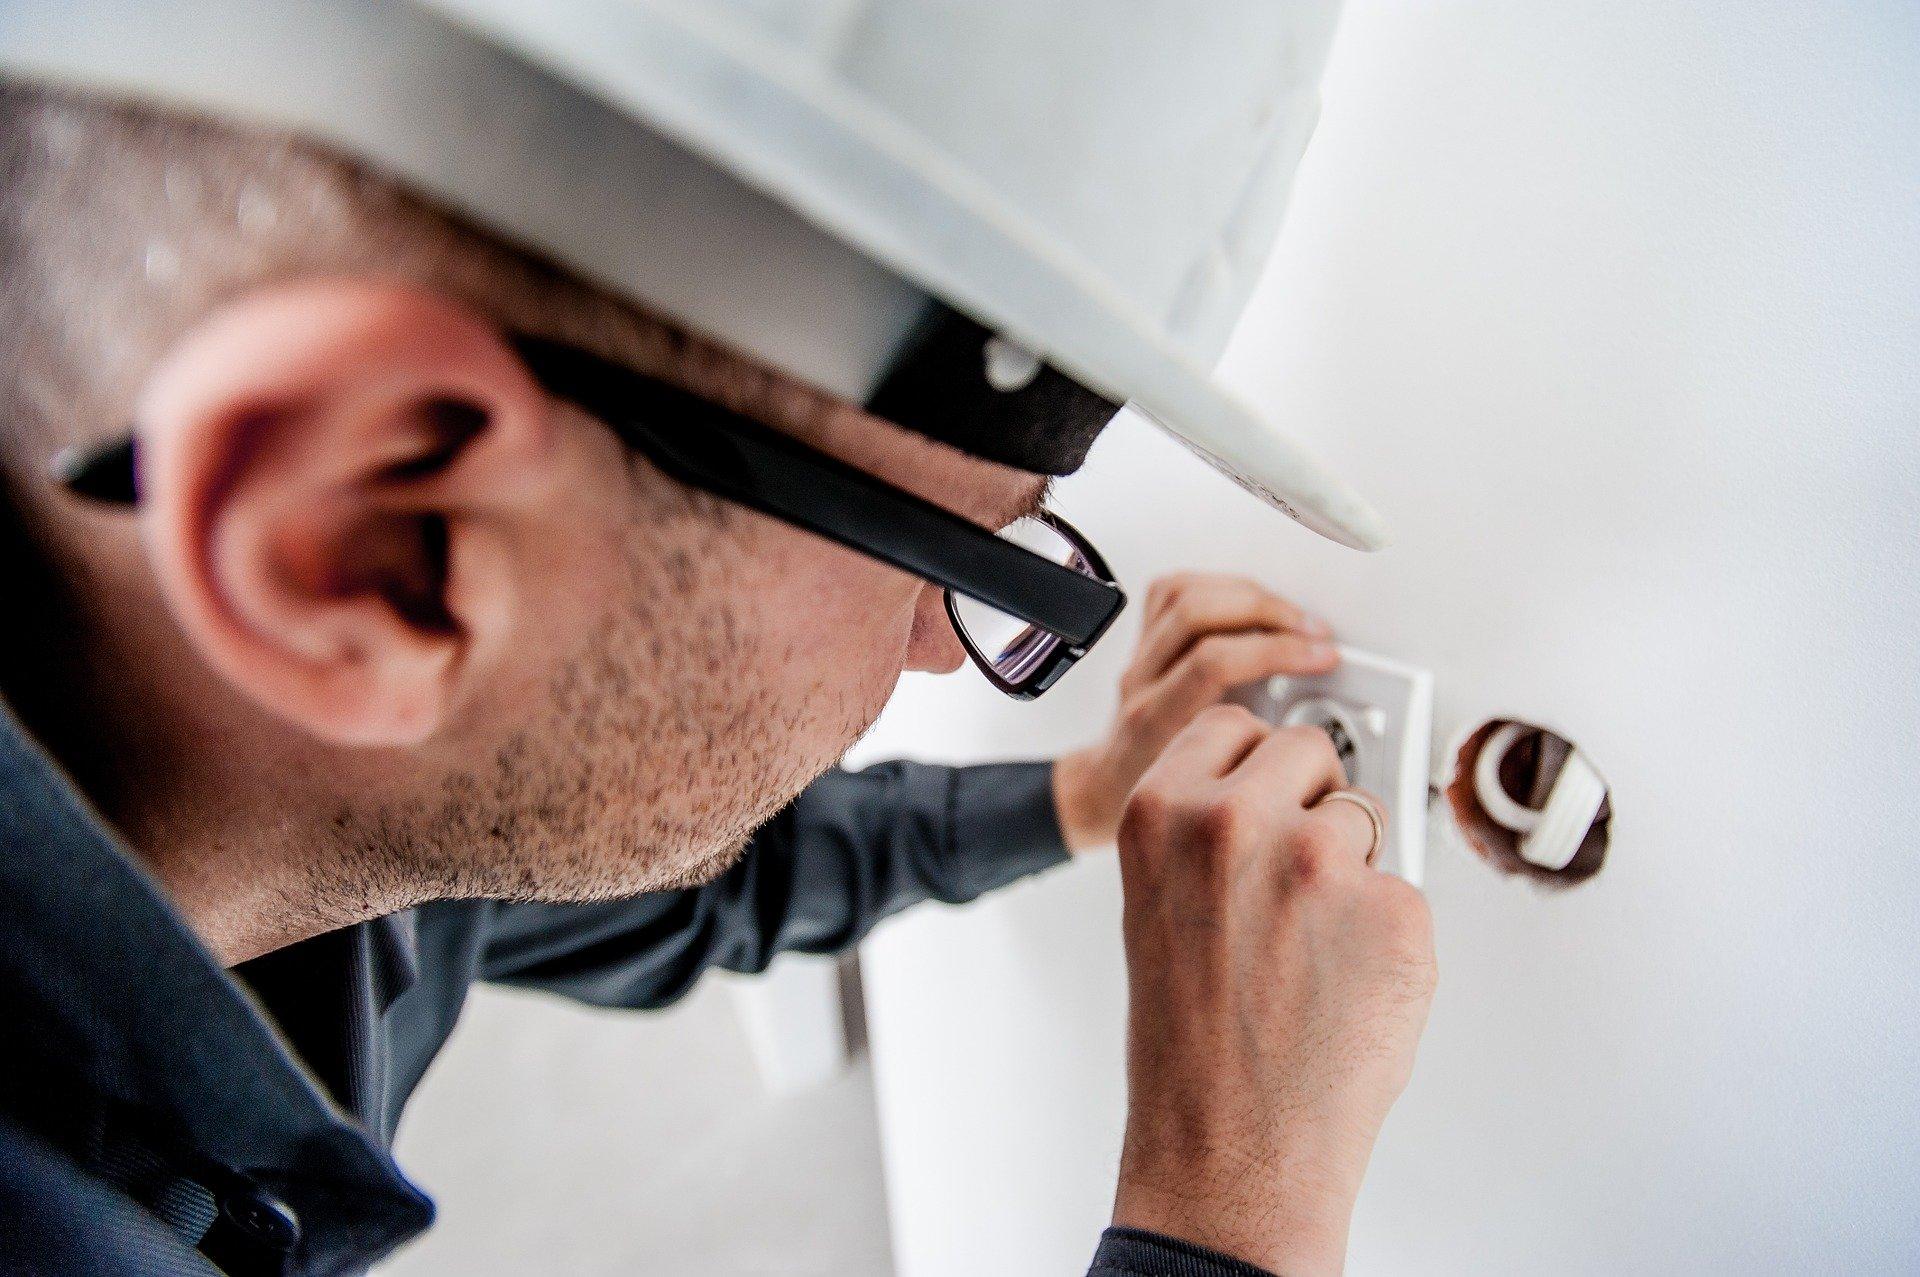 Elektriker installerer stikkontakt